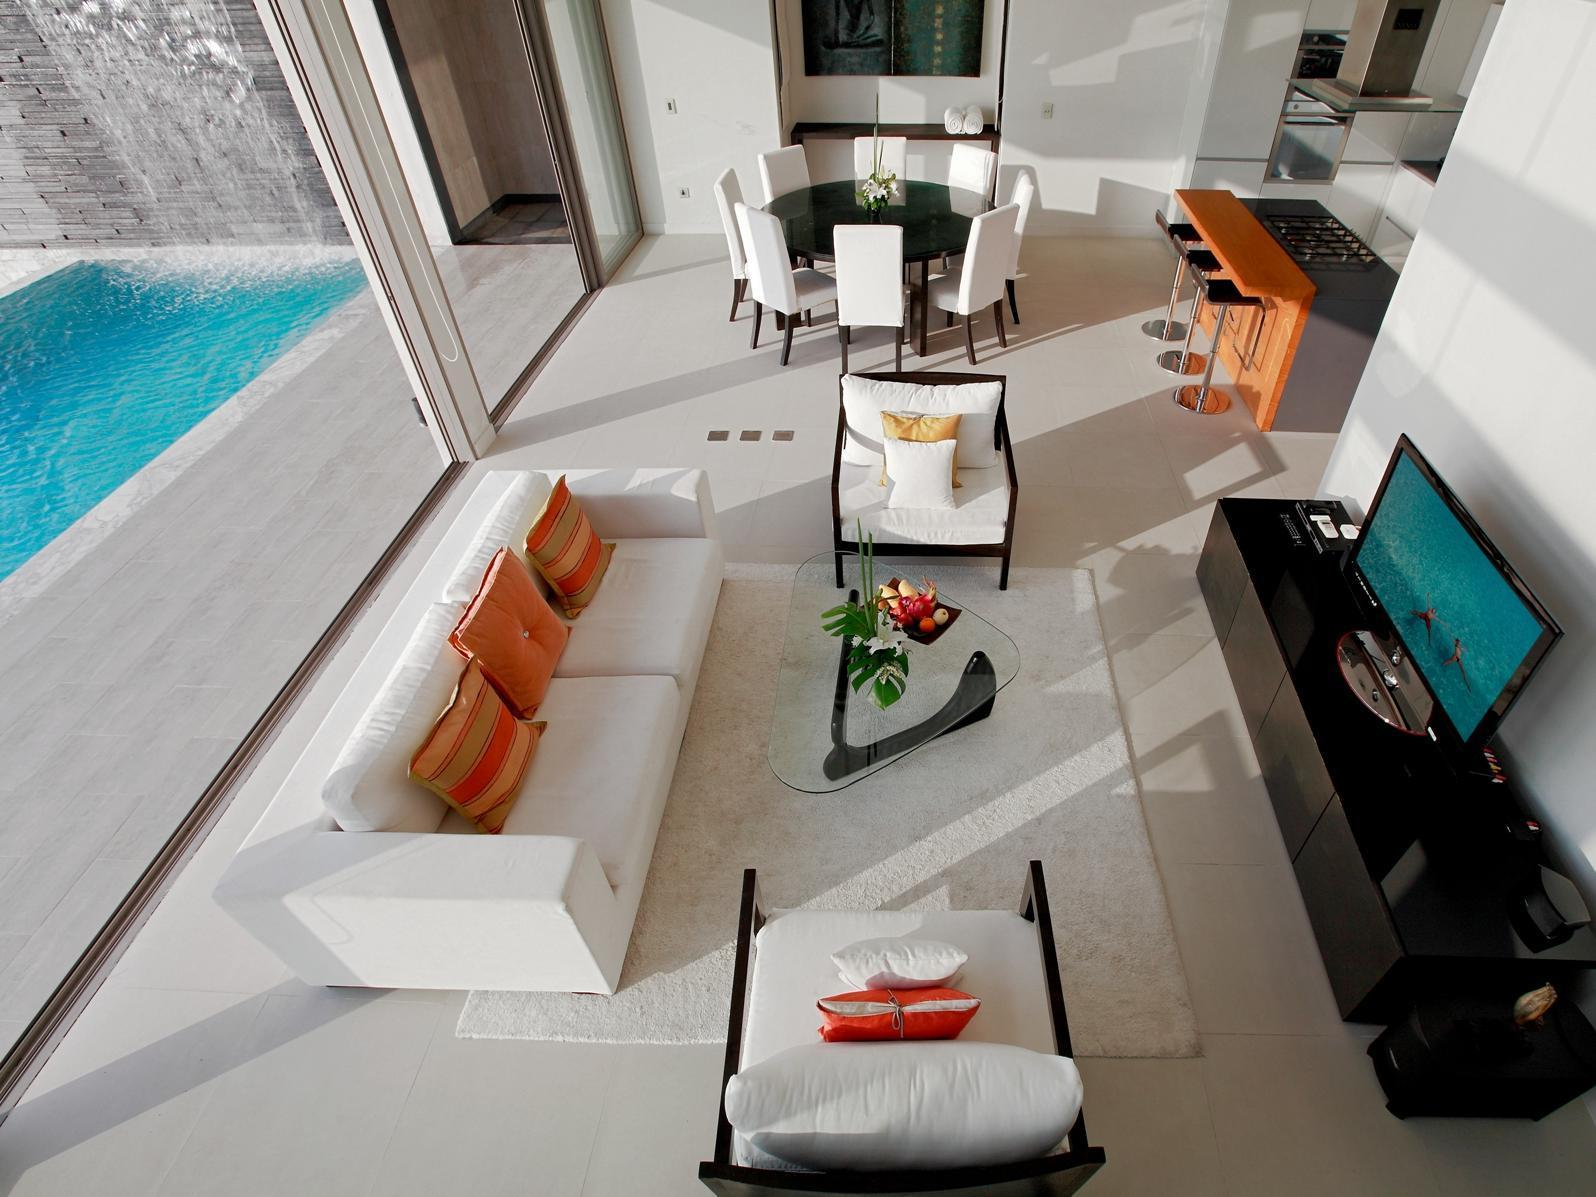 Cape Sienna Phuket Hotel and Villas16